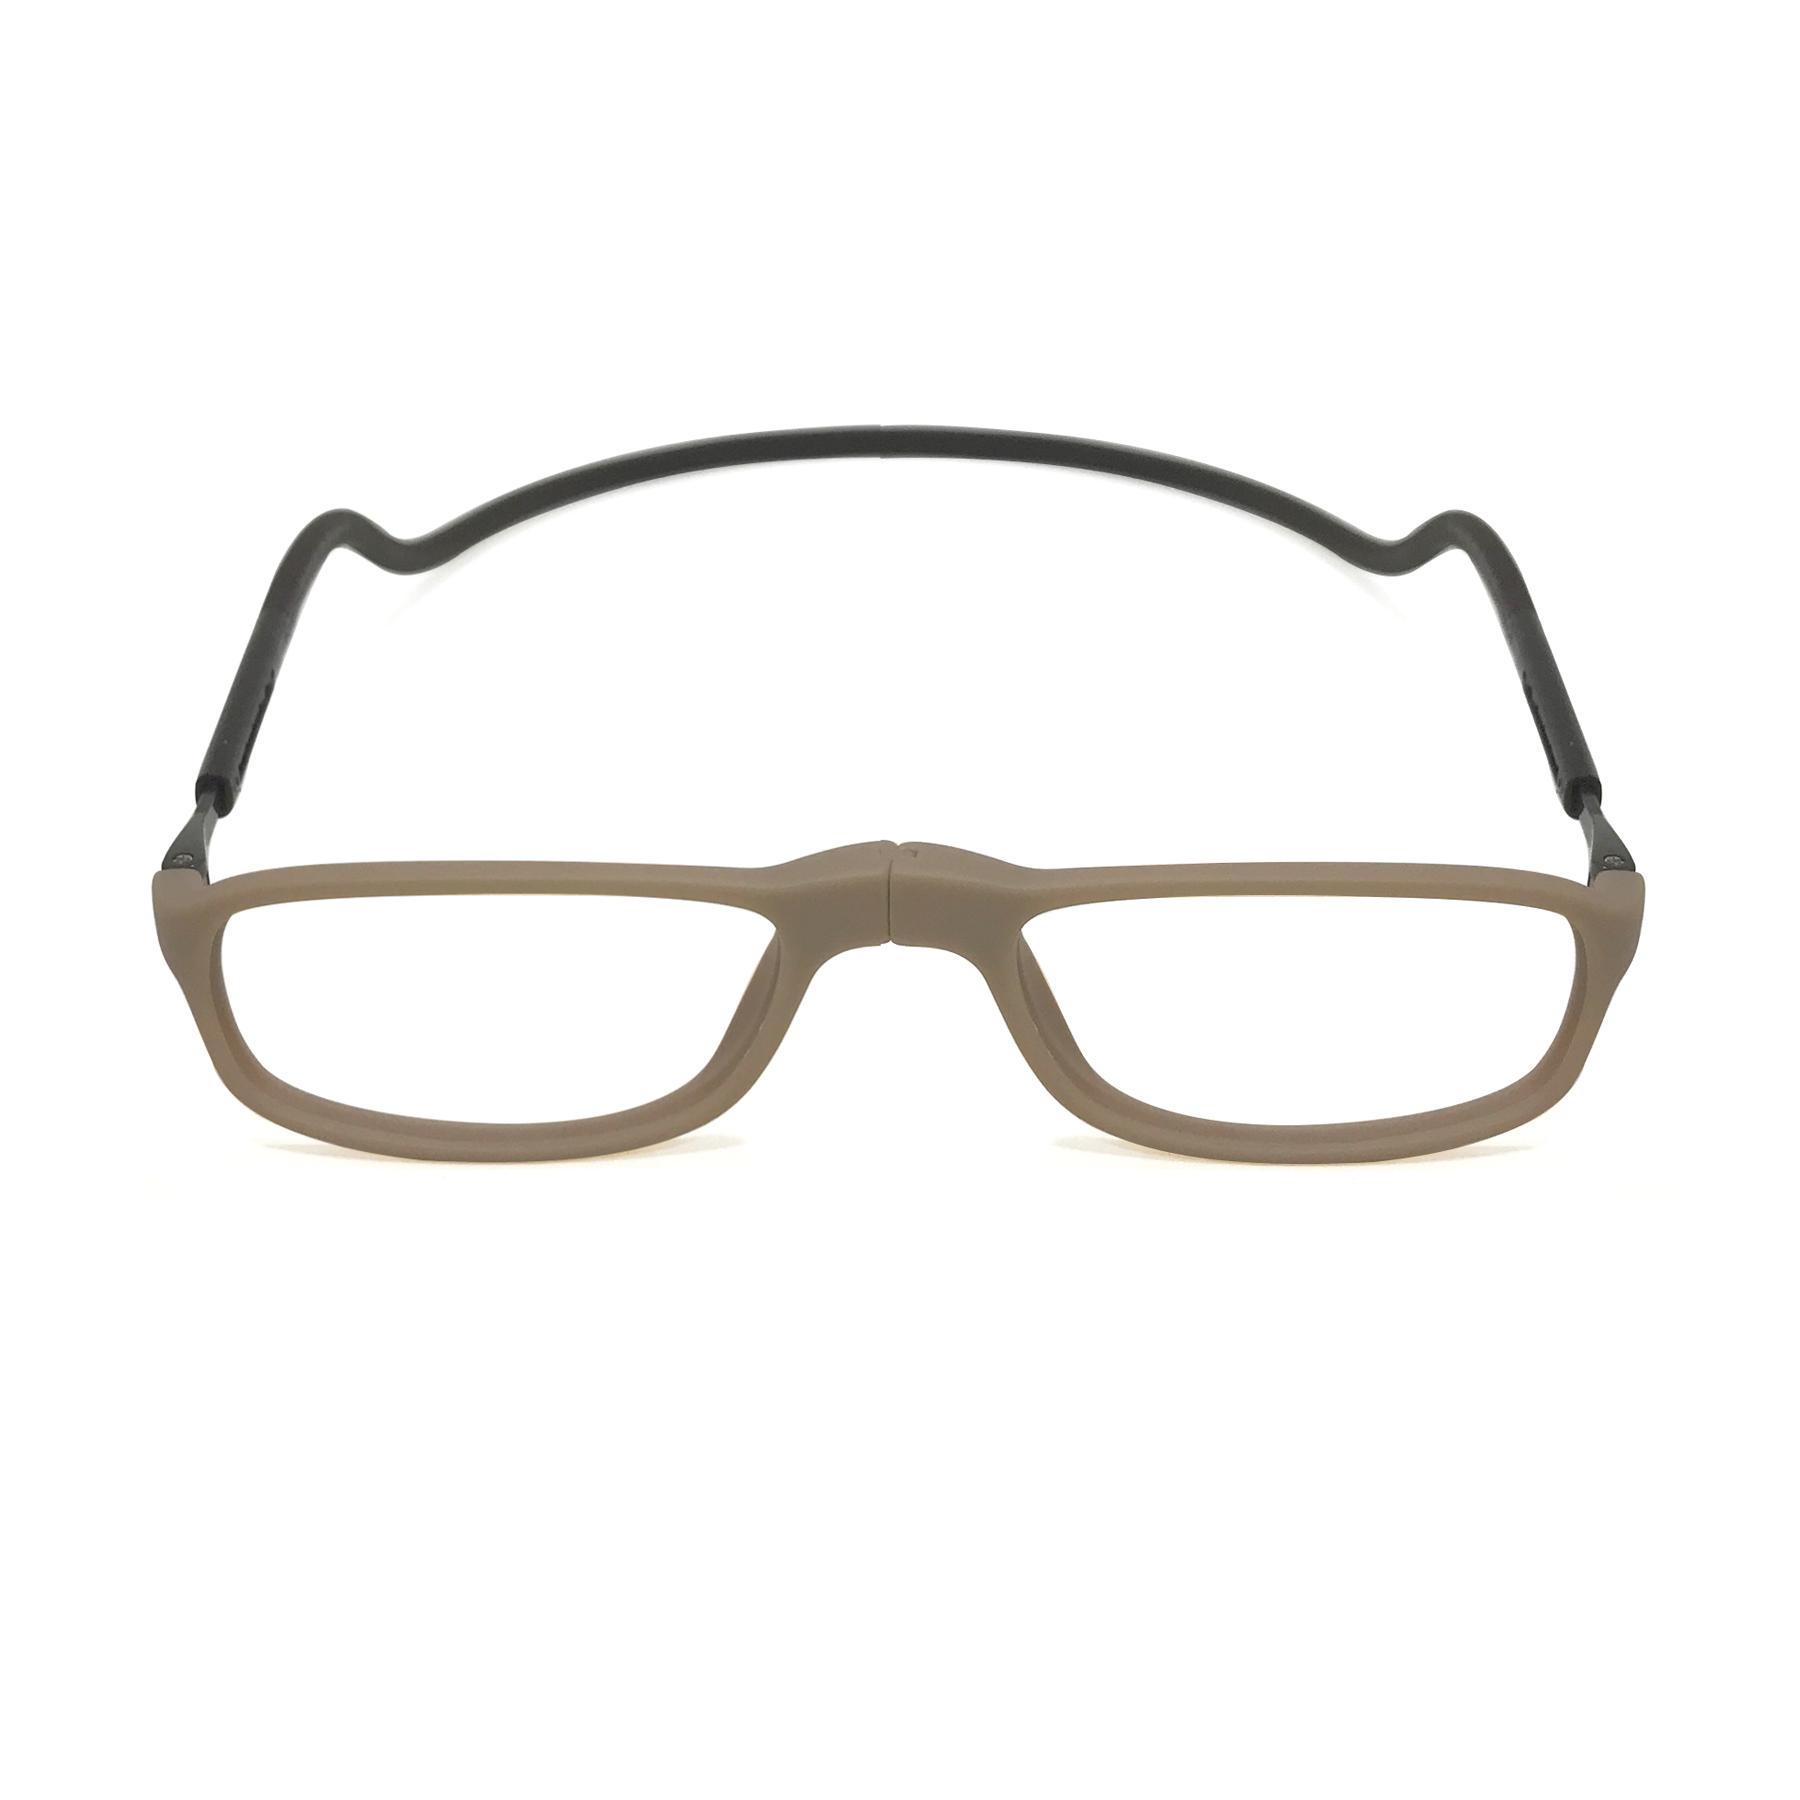 Vinaldi Plus 603 Optical Frames